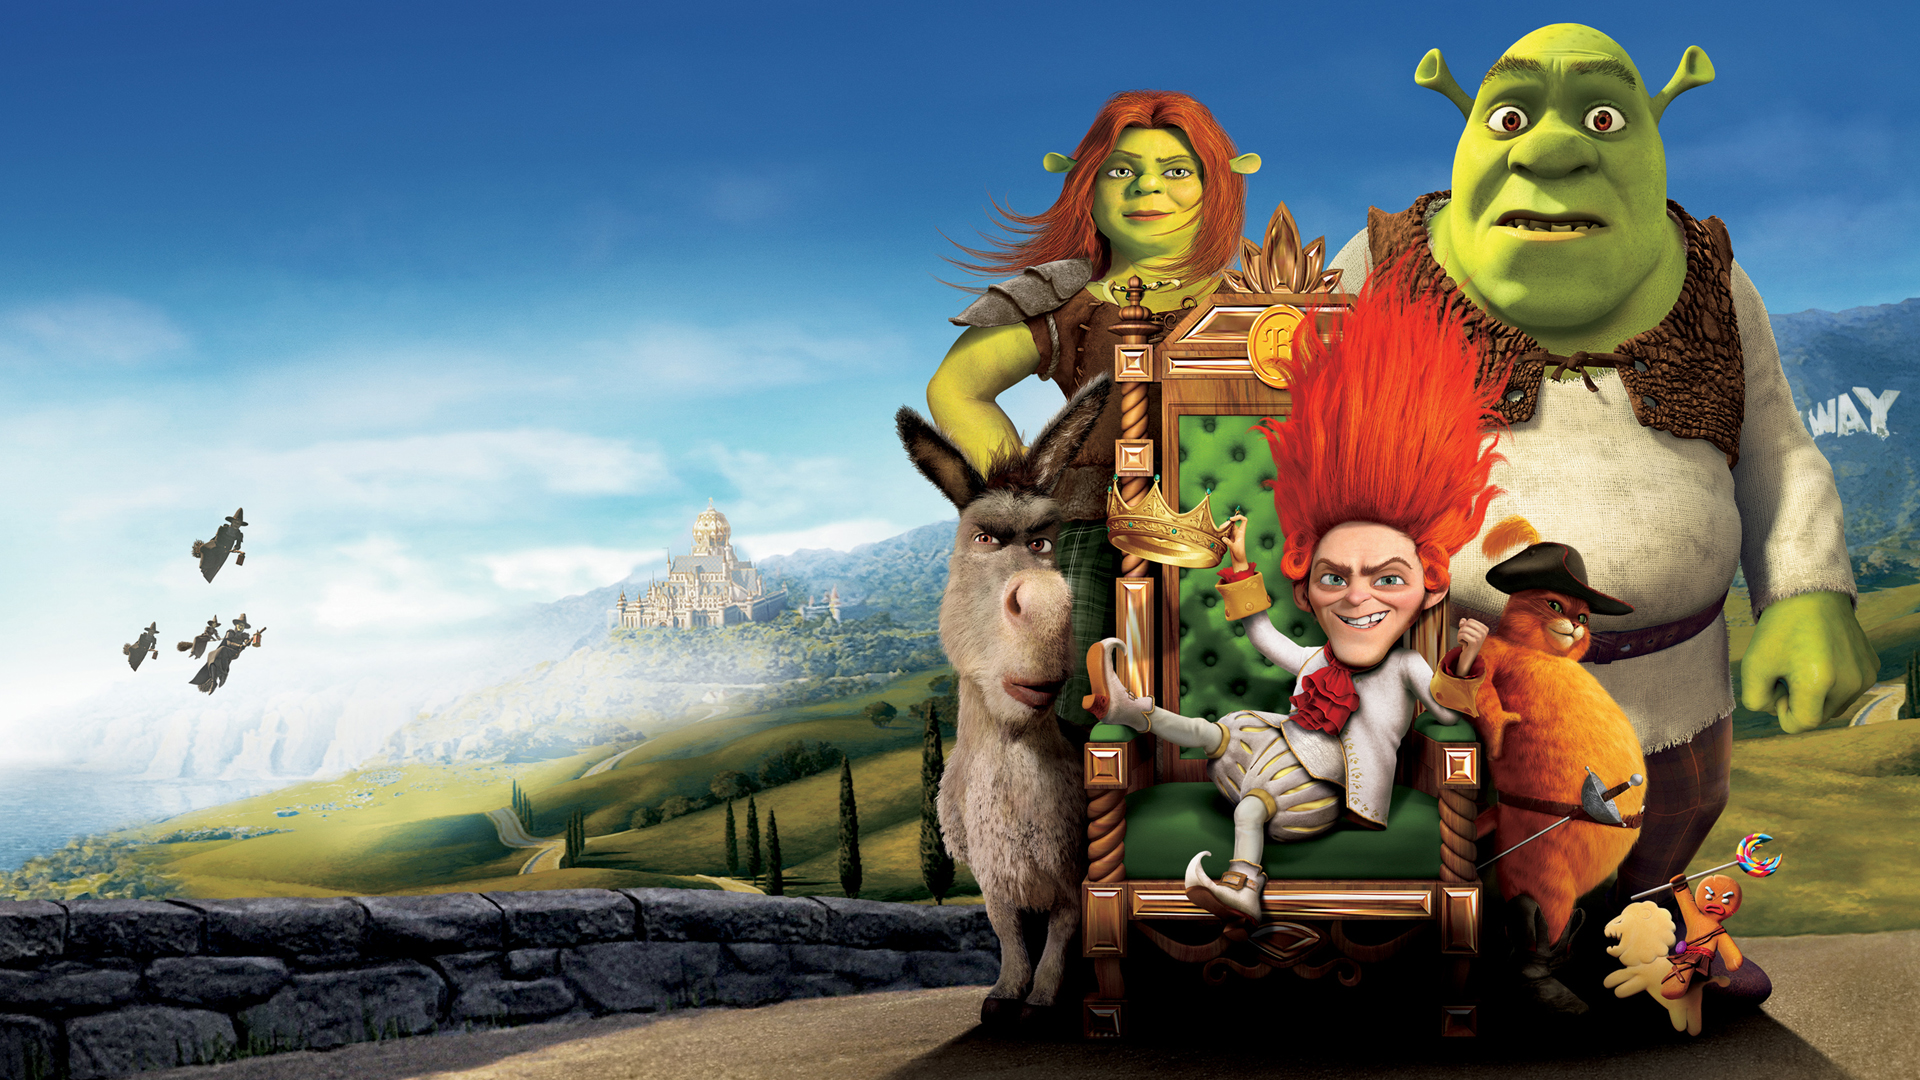 shrek 3 full movie download 720p